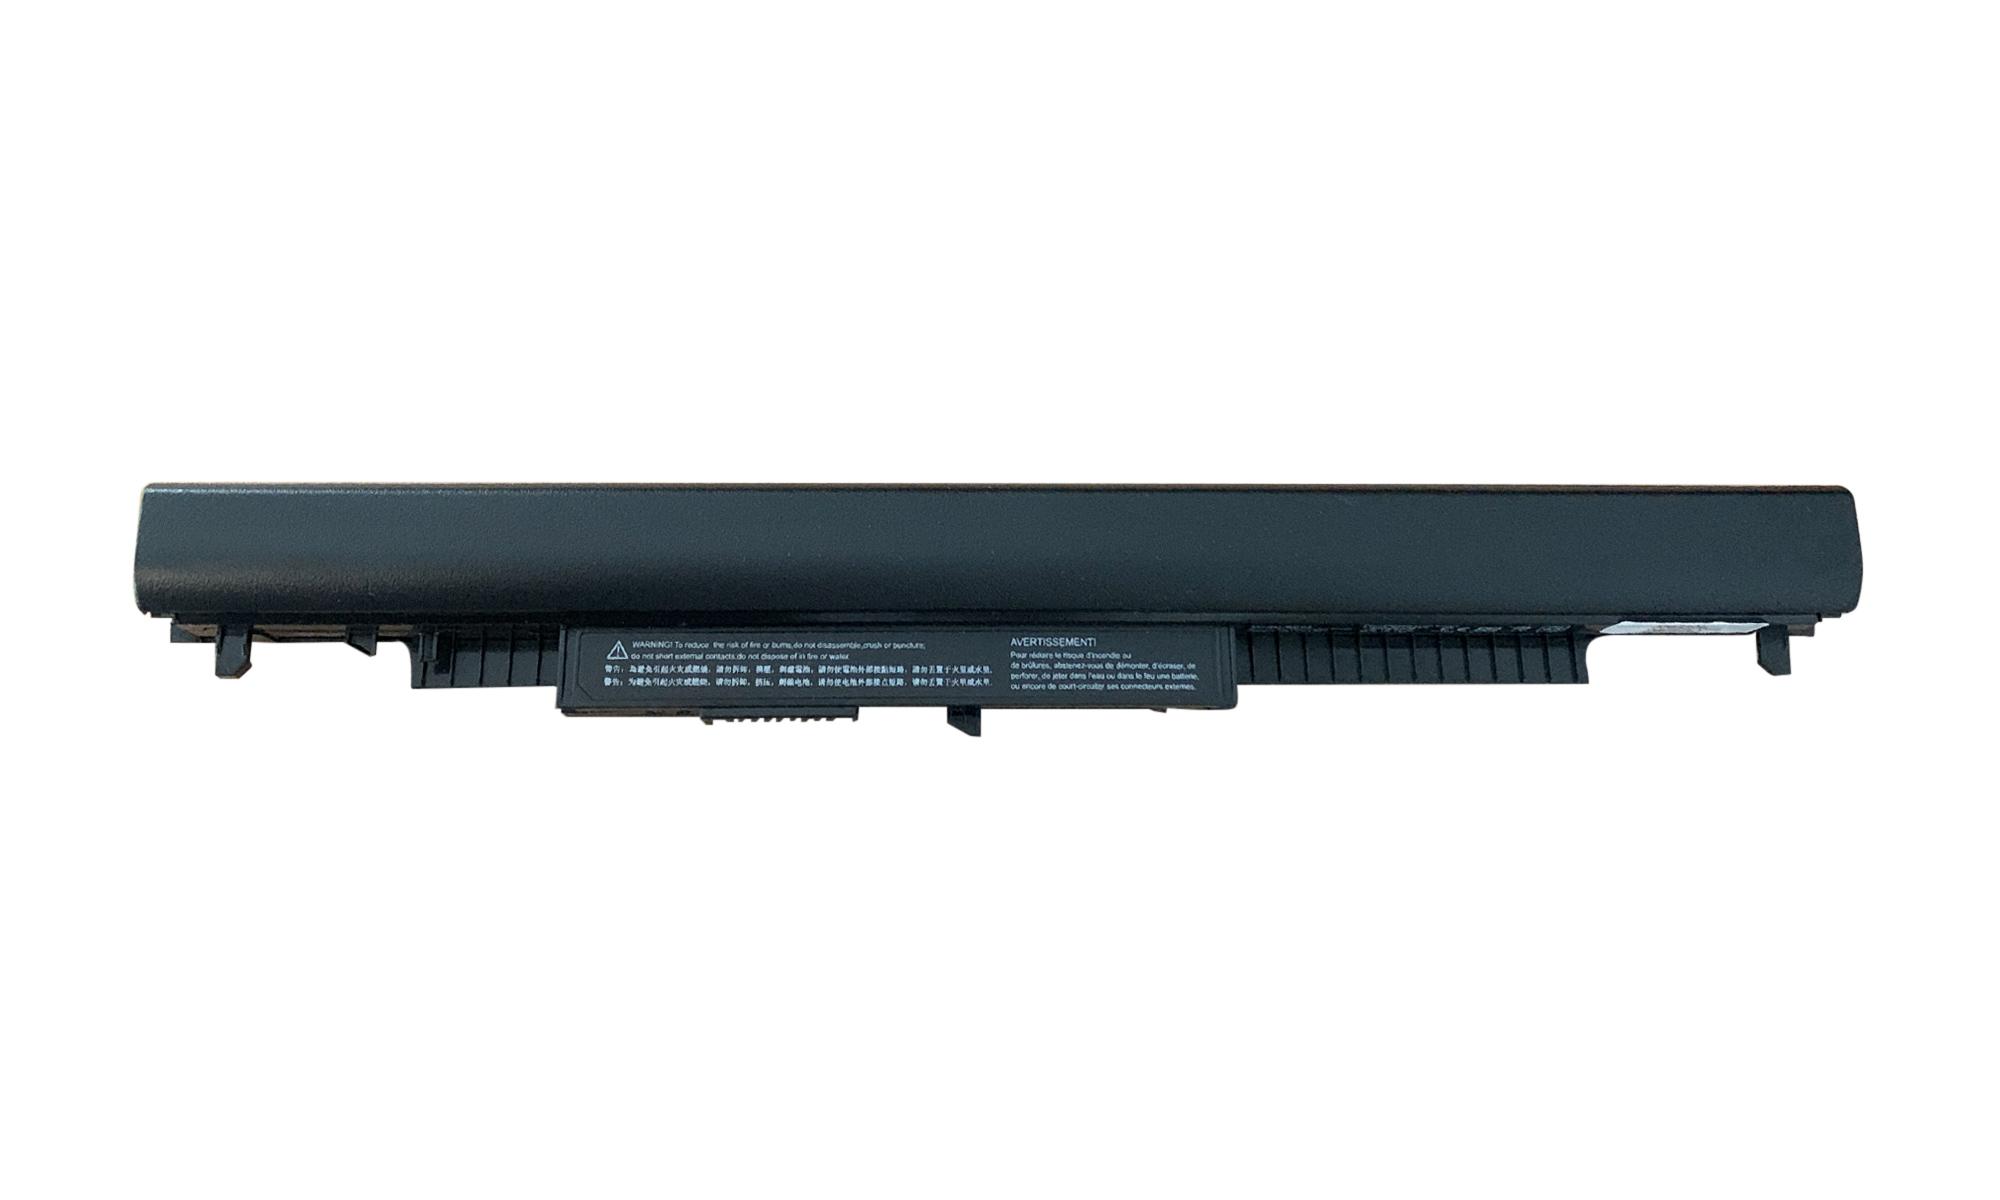 Baterie compatibila HP 240 G4, 245 G4, 240 G5, 245 G5, 250 G4, 250 G5, 255 G4, 255 G5, 2200mAh 33Wh